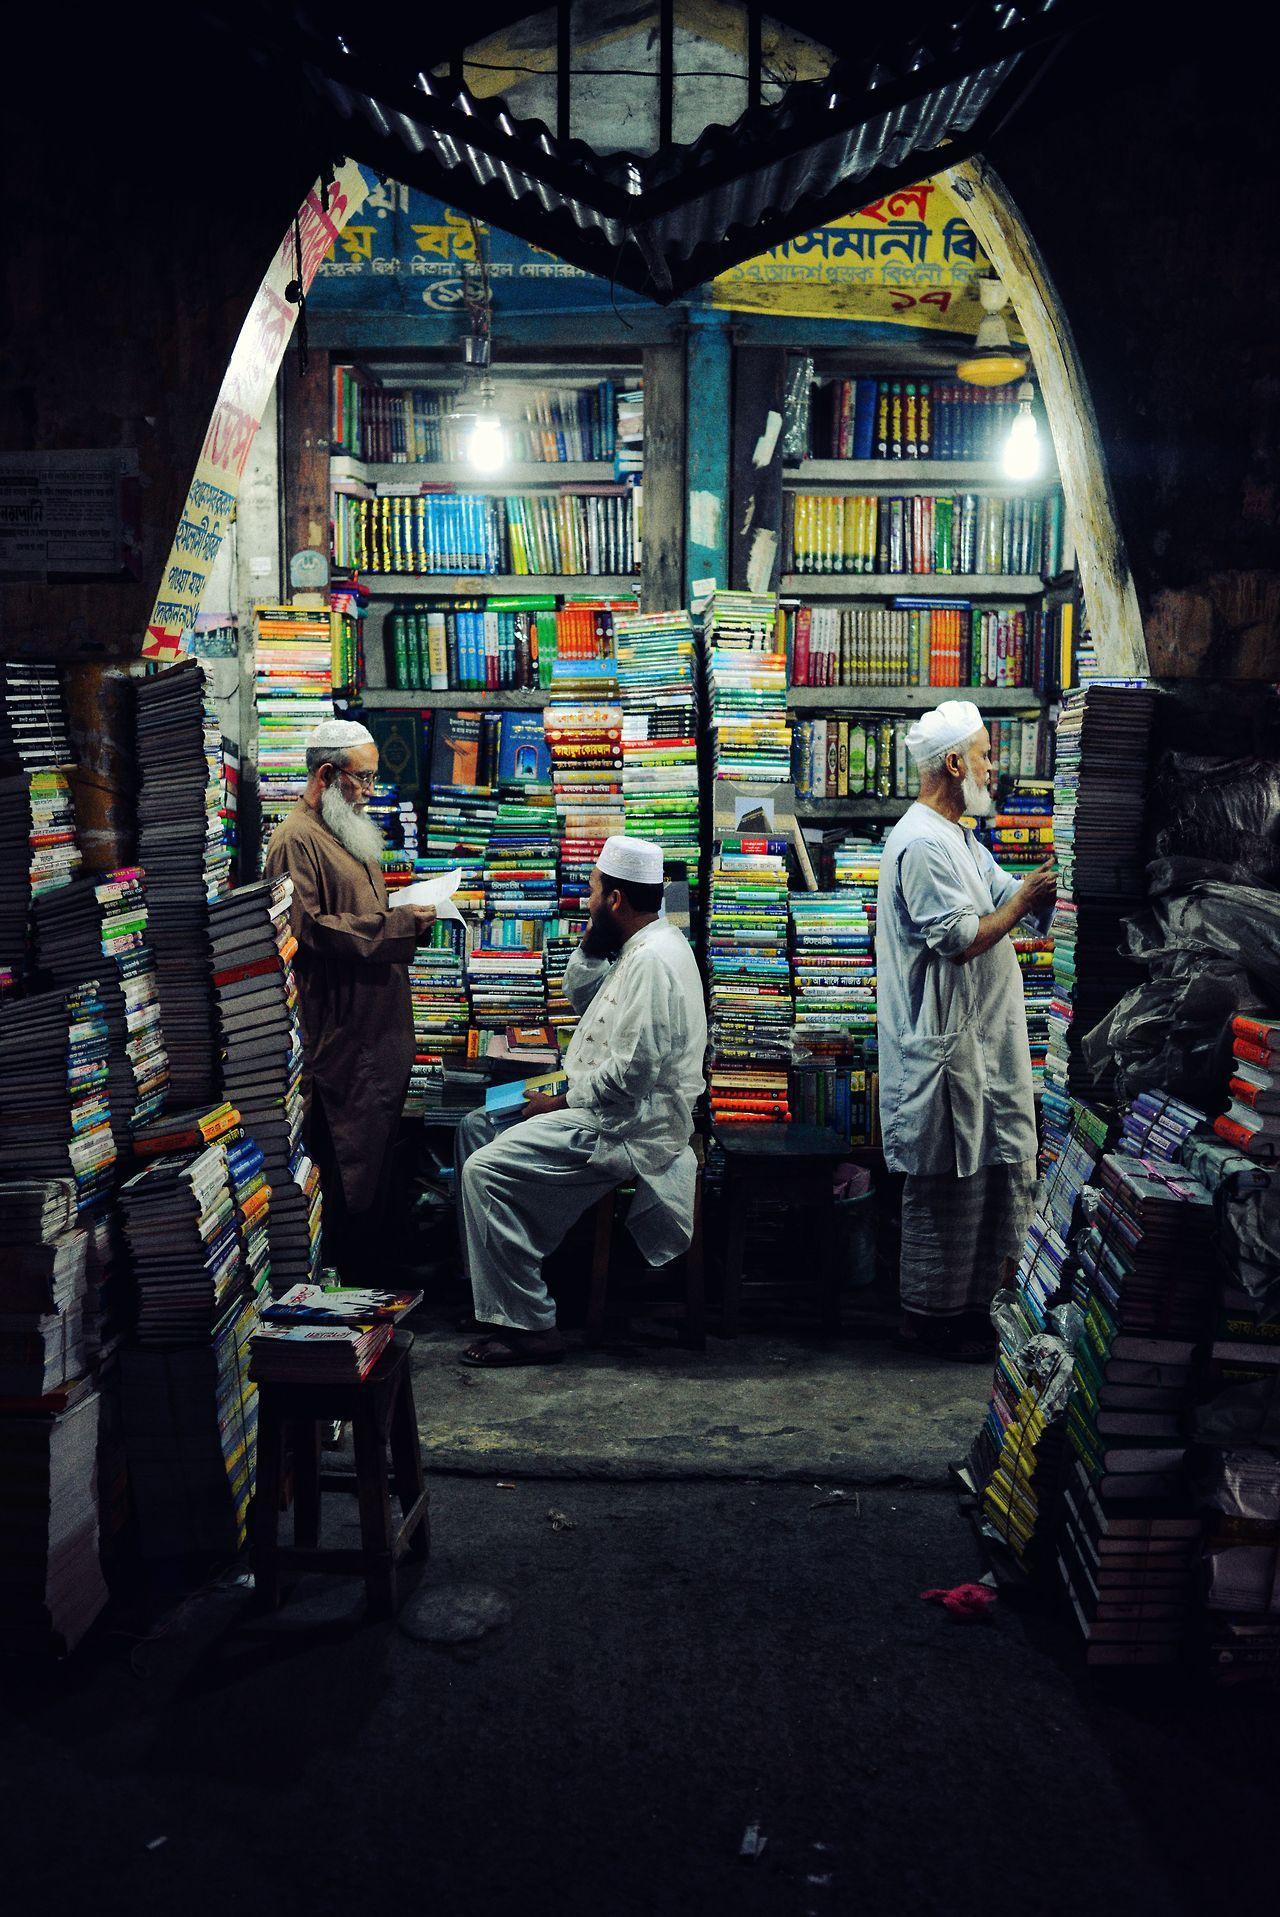 Book Store In Bangladesh Travel Travel Bangladesh Asia Southeastasia Visitbangladesh Explorebangladesh Beautifuldes Bangladesh Travel India Street Asia